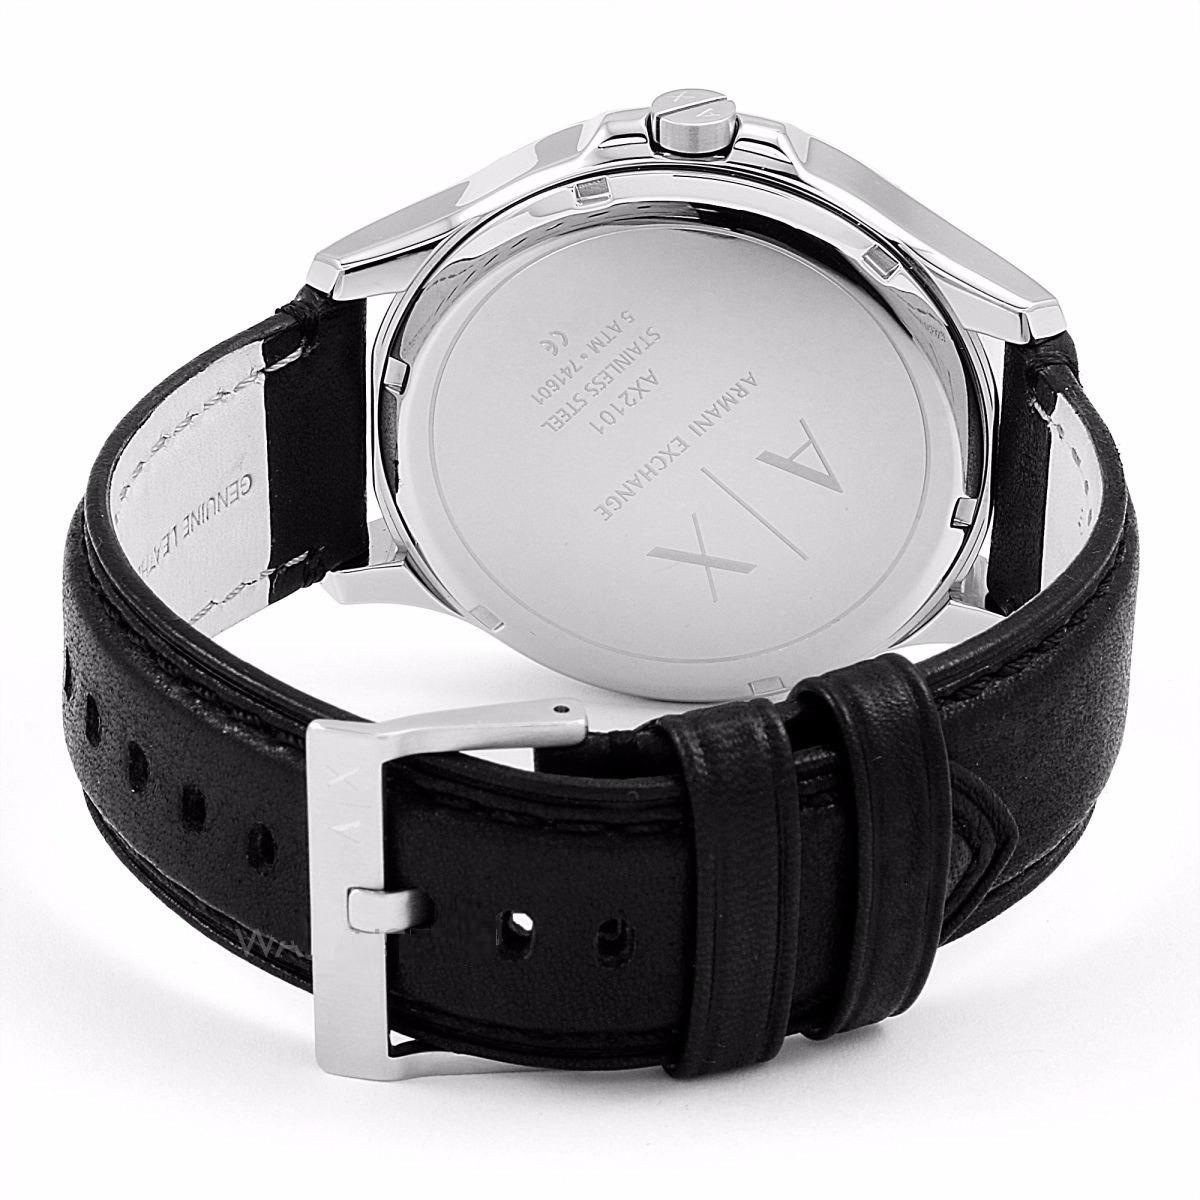 4bff381ddc99 reloj armani exchange ax2101 piel acero negro plateado. Cargando zoom.